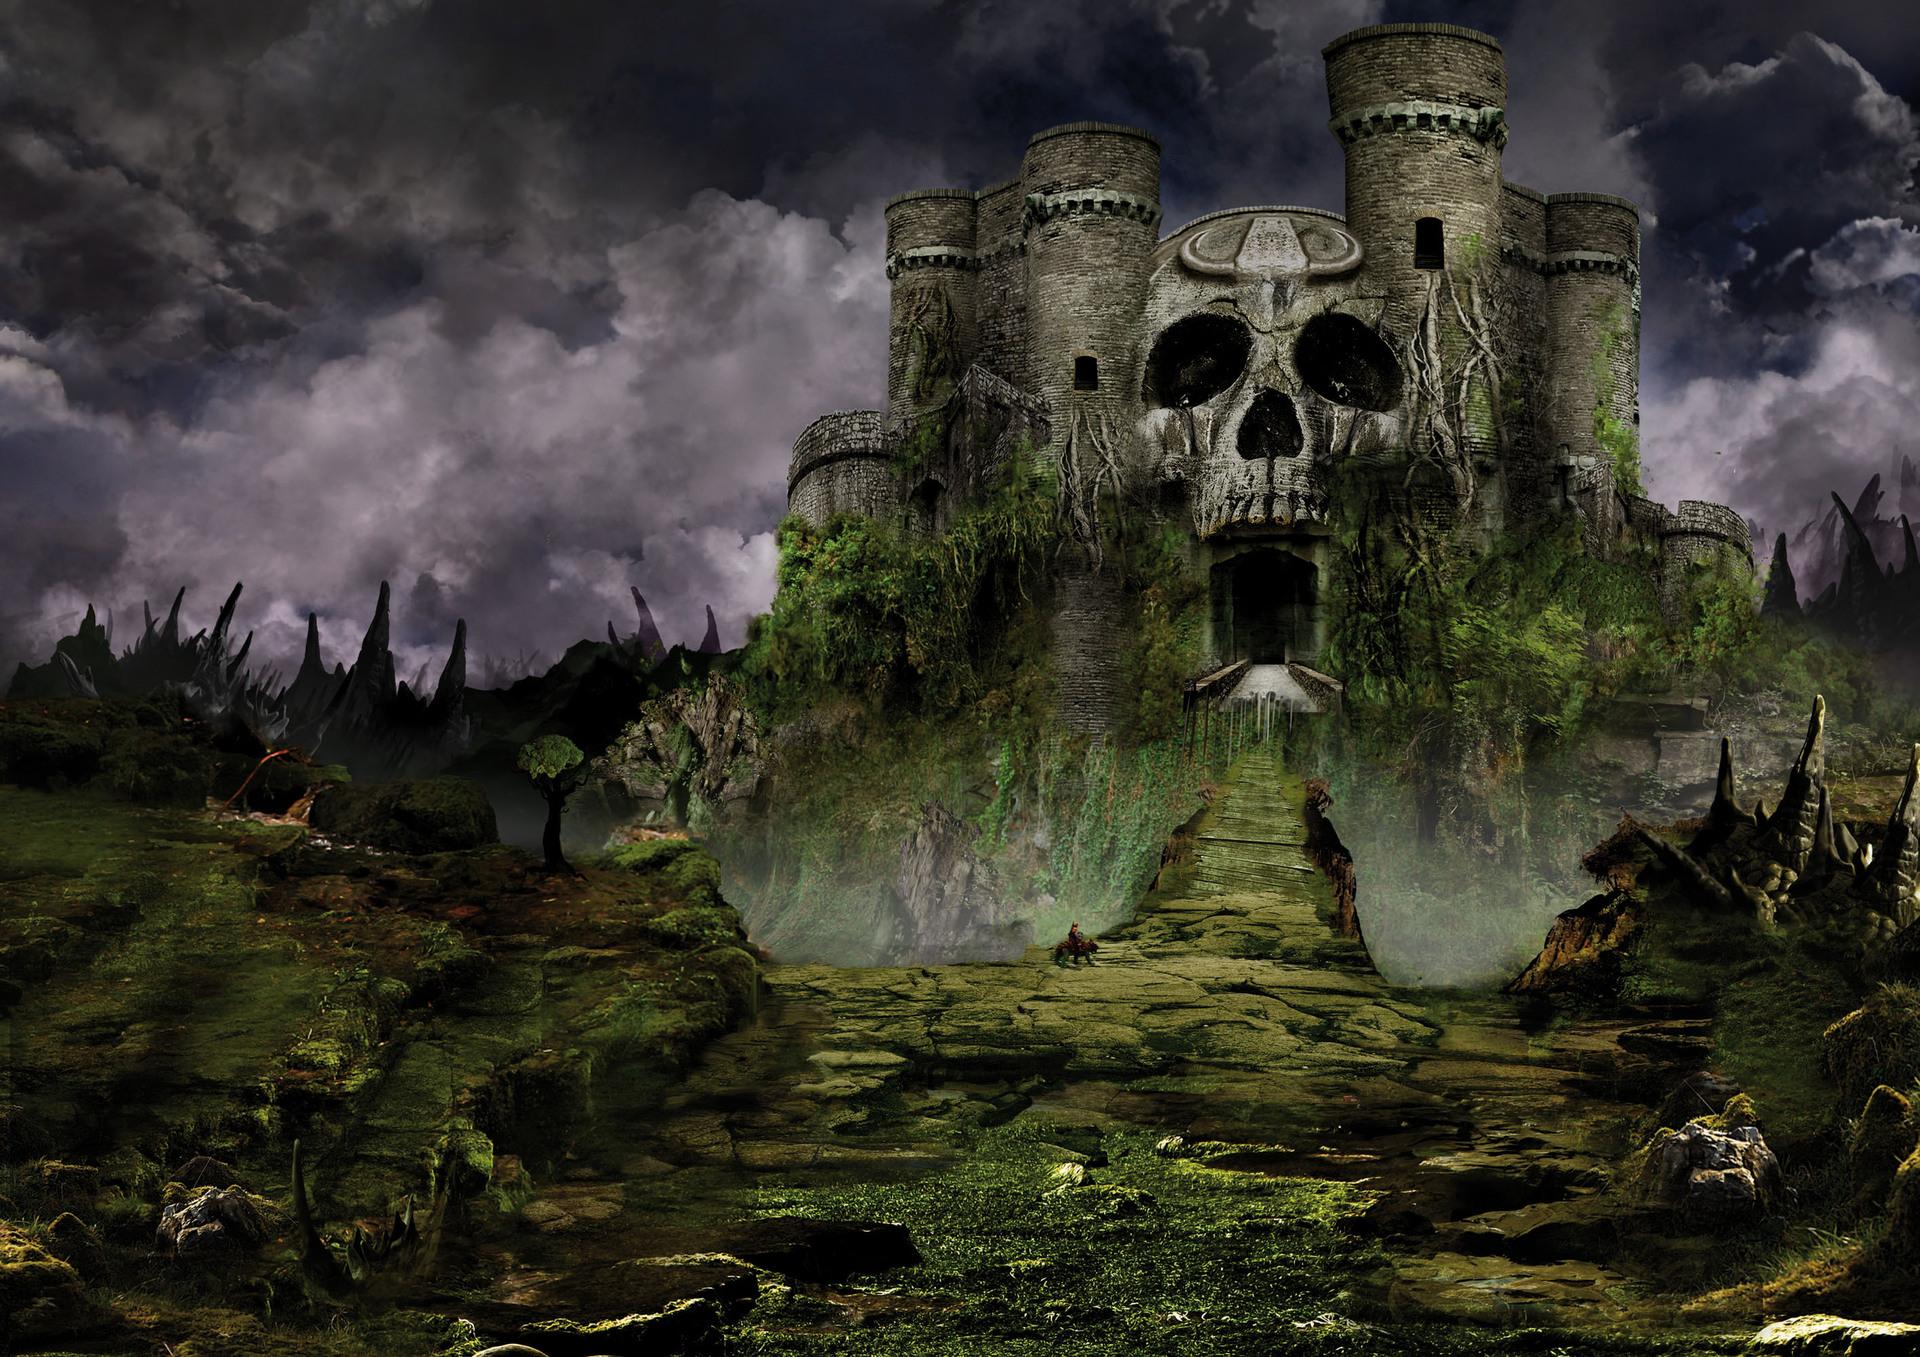 Castle_Grayskull_Large_Classic_Head.jpg?1399017563